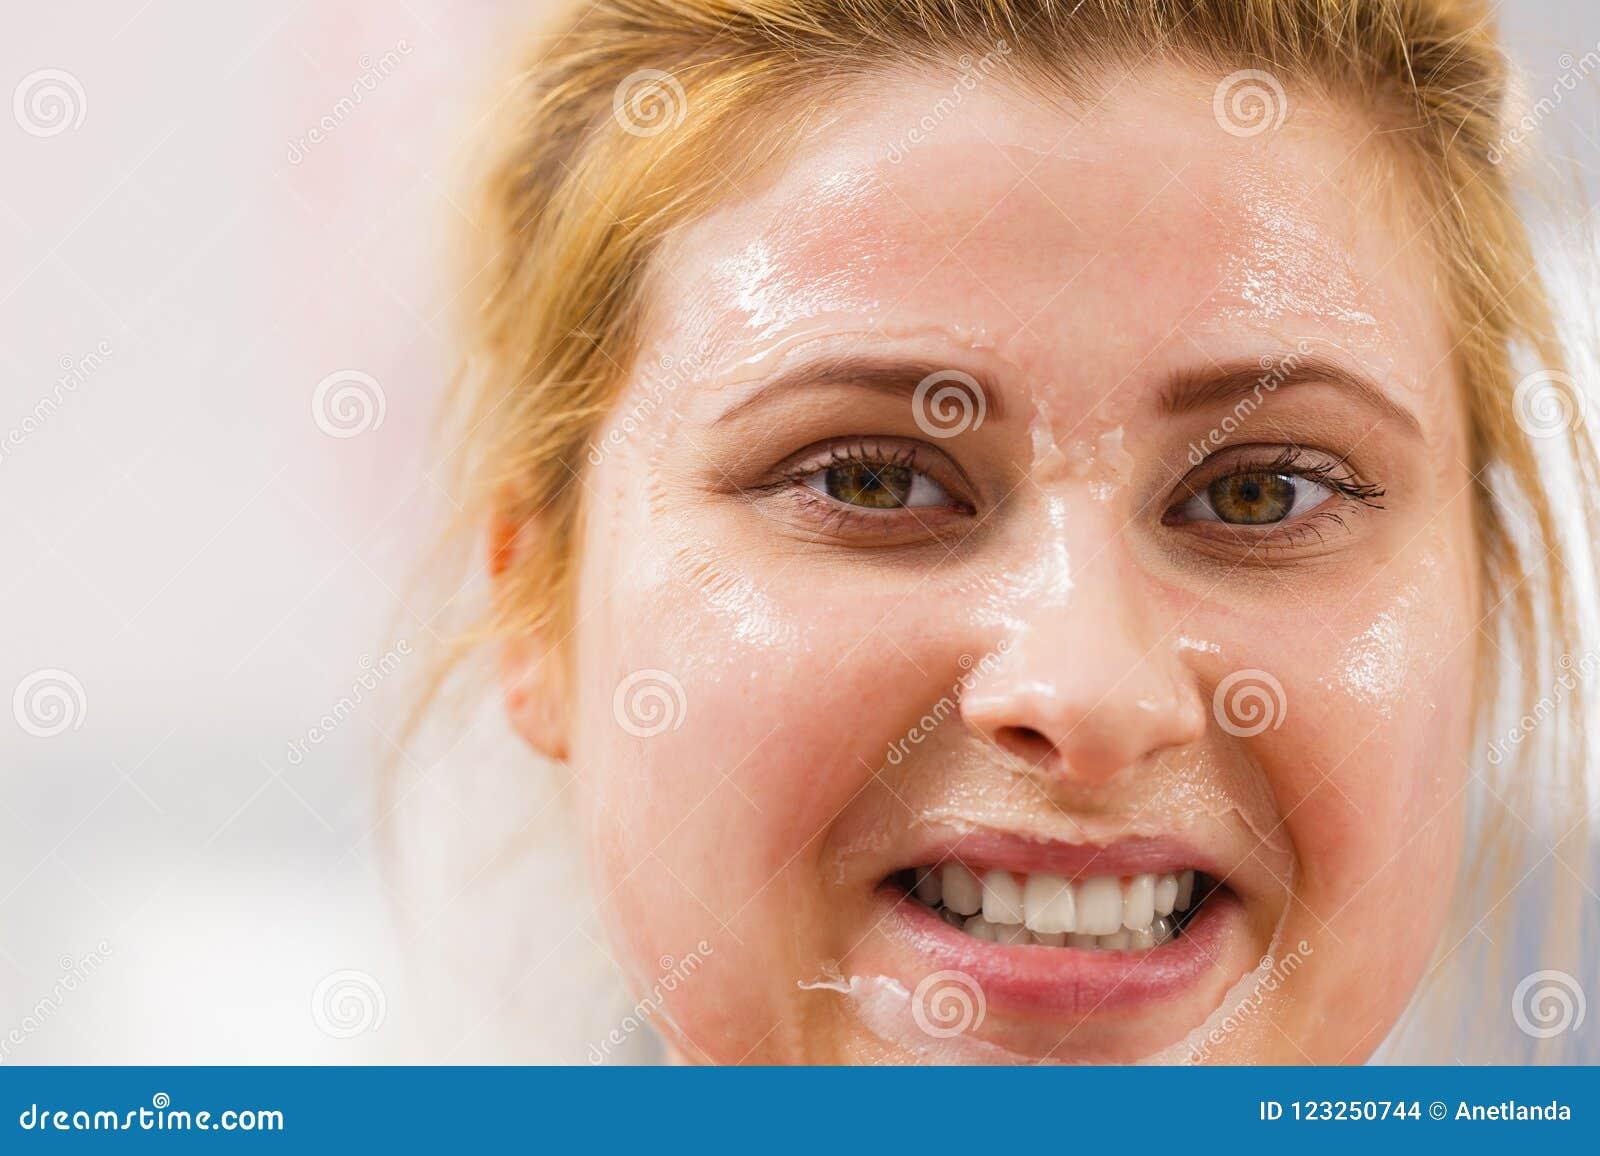 having dry skin